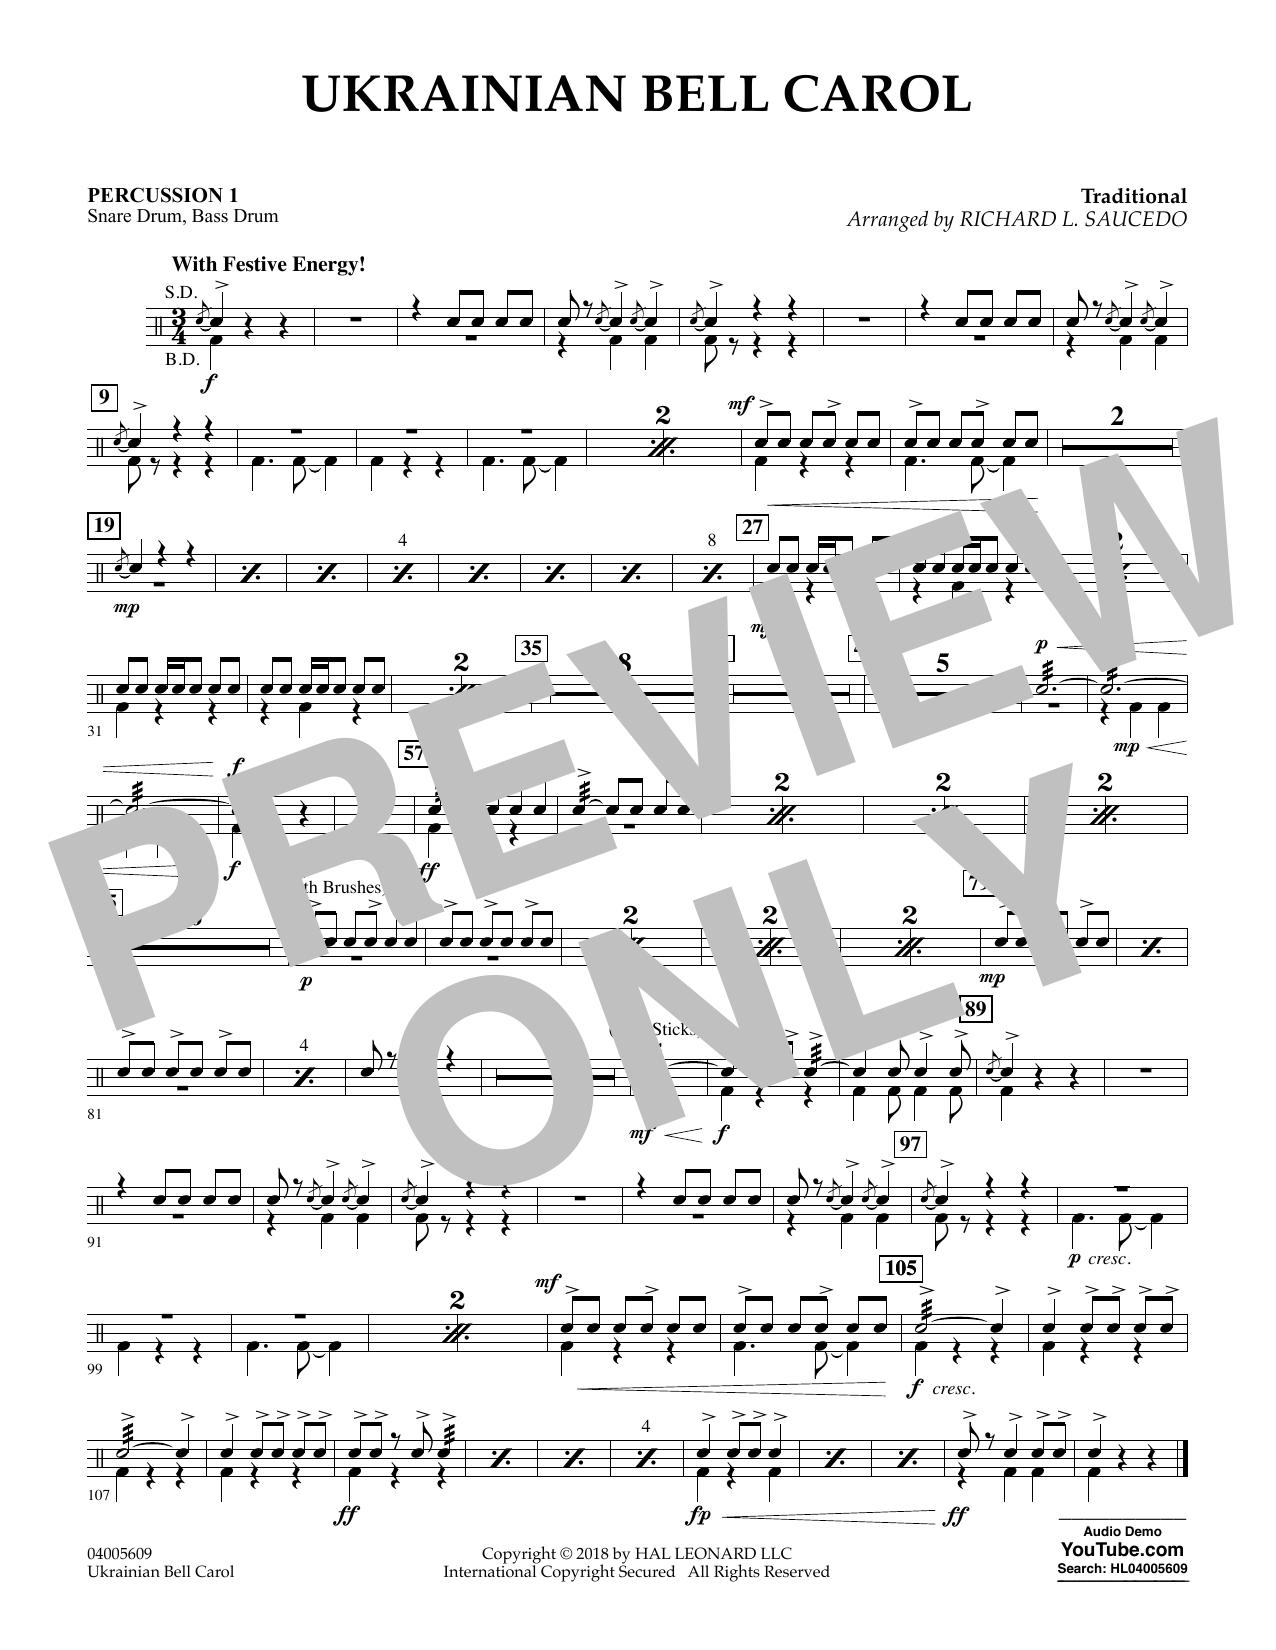 Ukrainian Bell Carol - Percussion 1 (Concert Band)